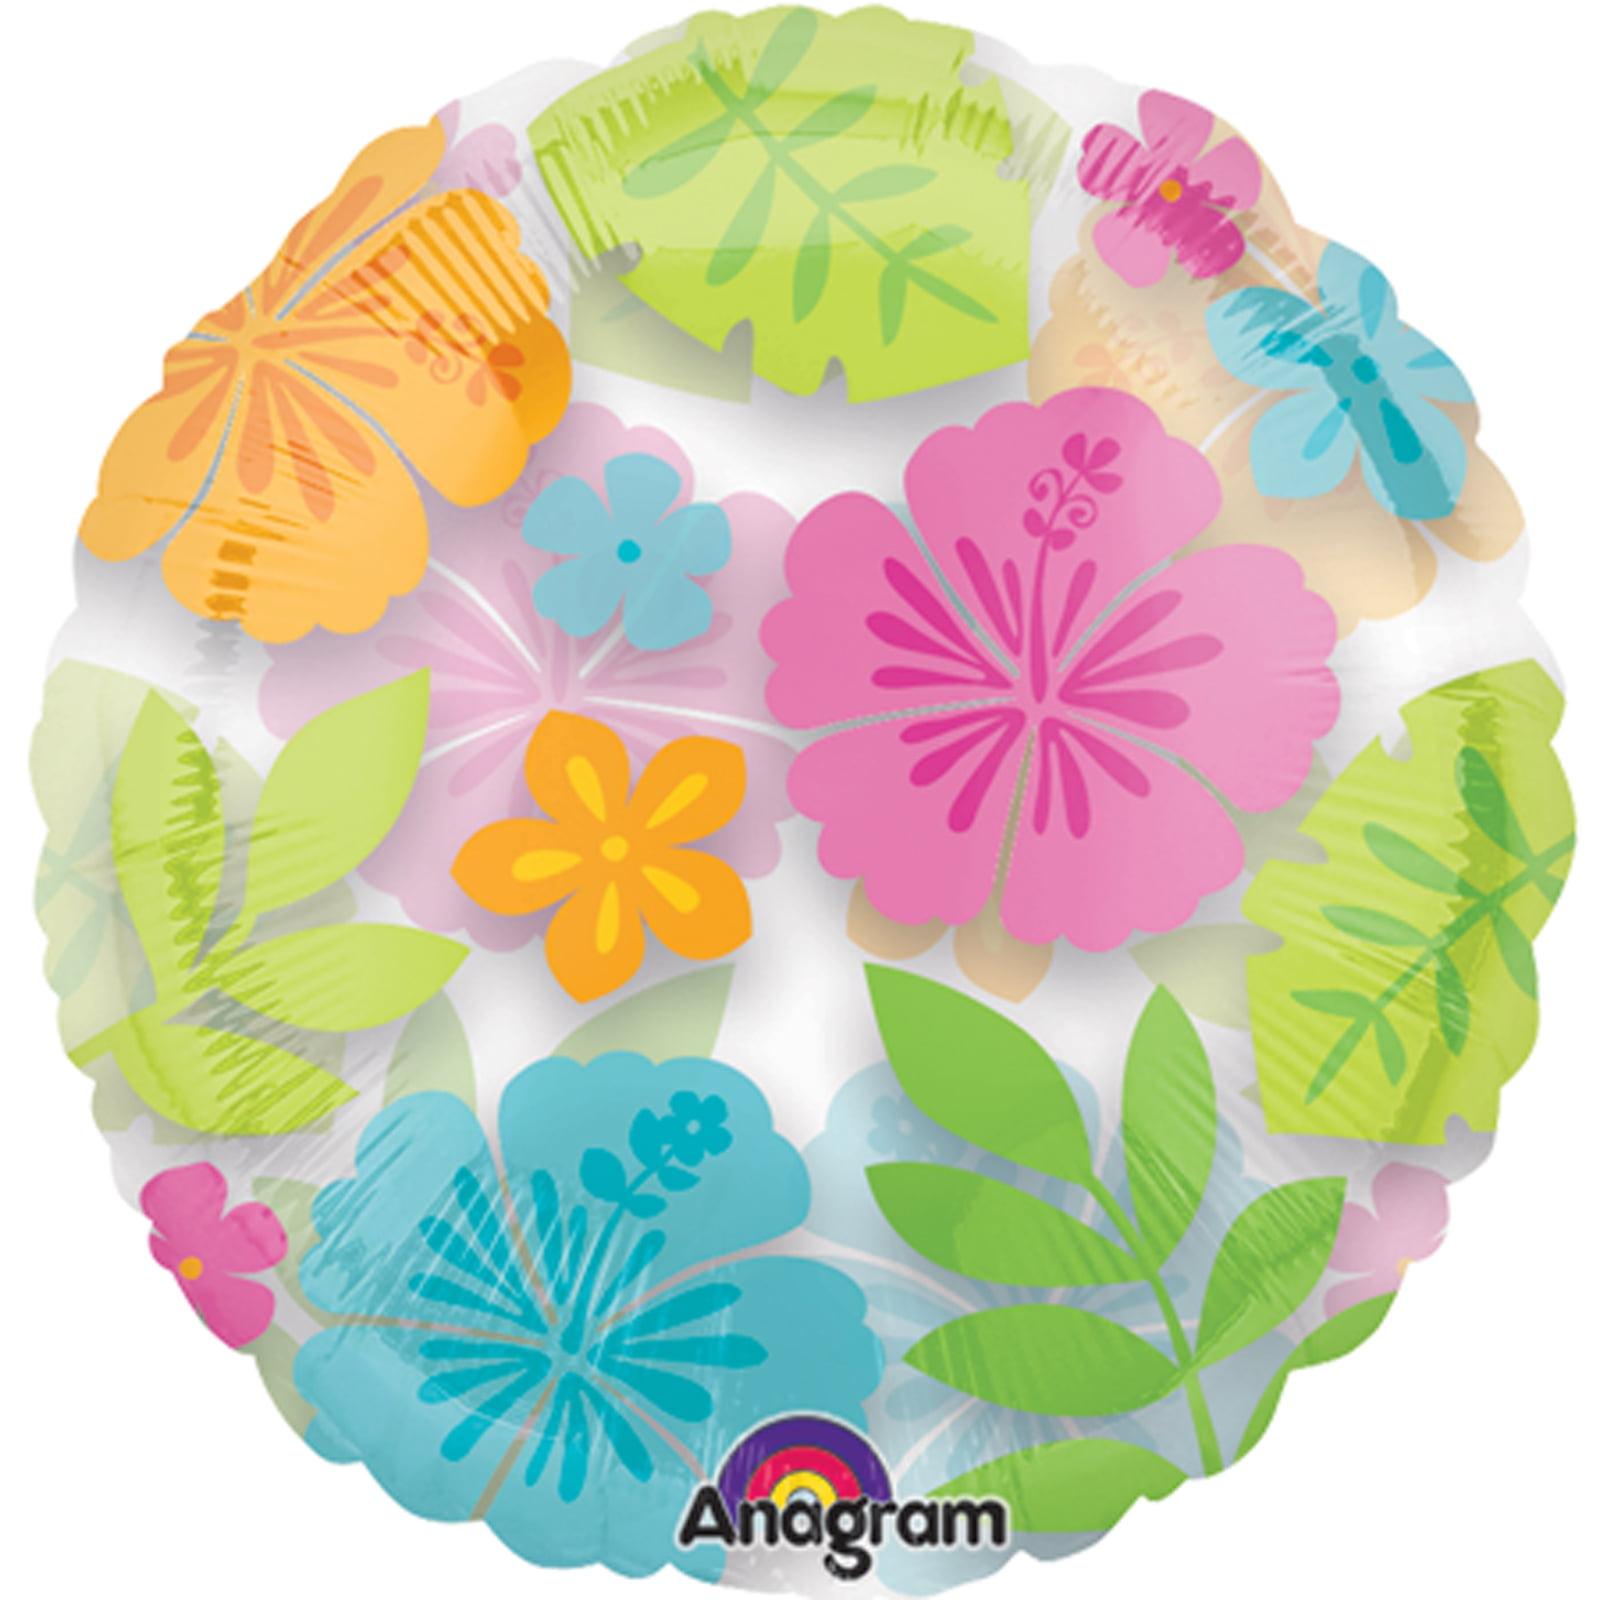 "Anagram Wild Isle Magicolor Tropical Luau Flower 18"" Foil Balloon, Clear"